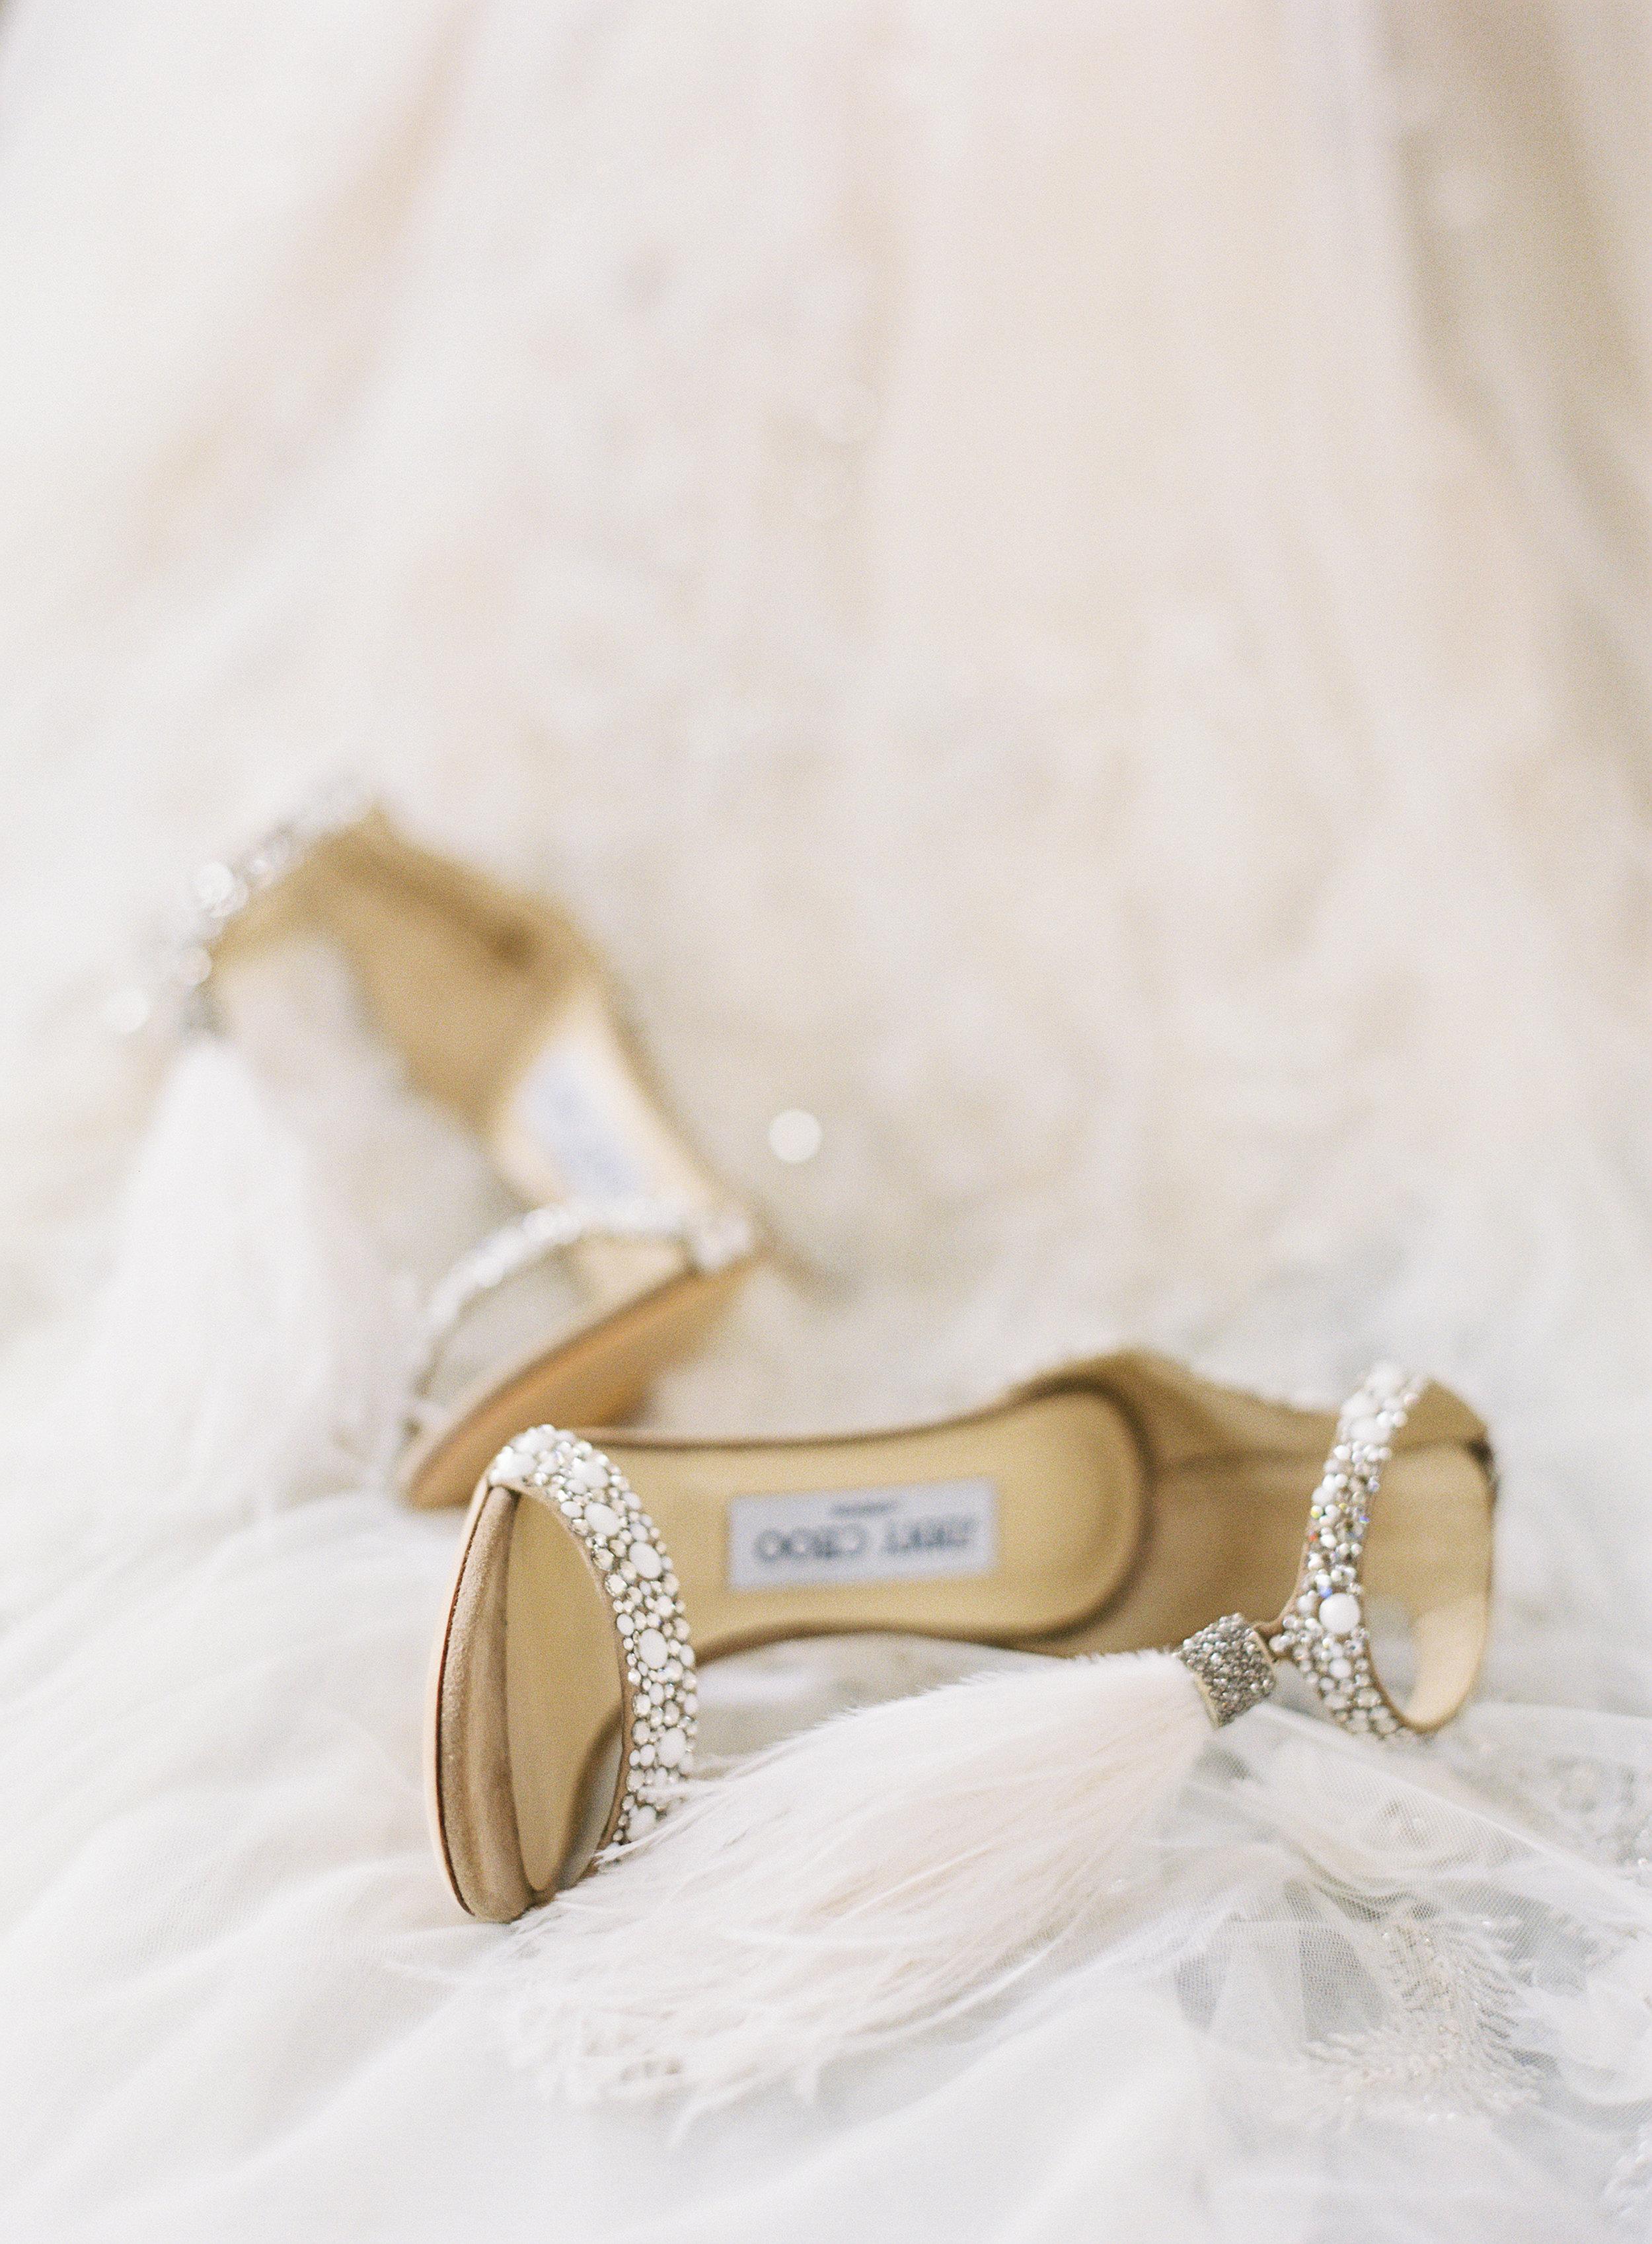 Athenaeum_Wedding_Hi_Res-3-Jen_Huang-005192-R1-002.jpg